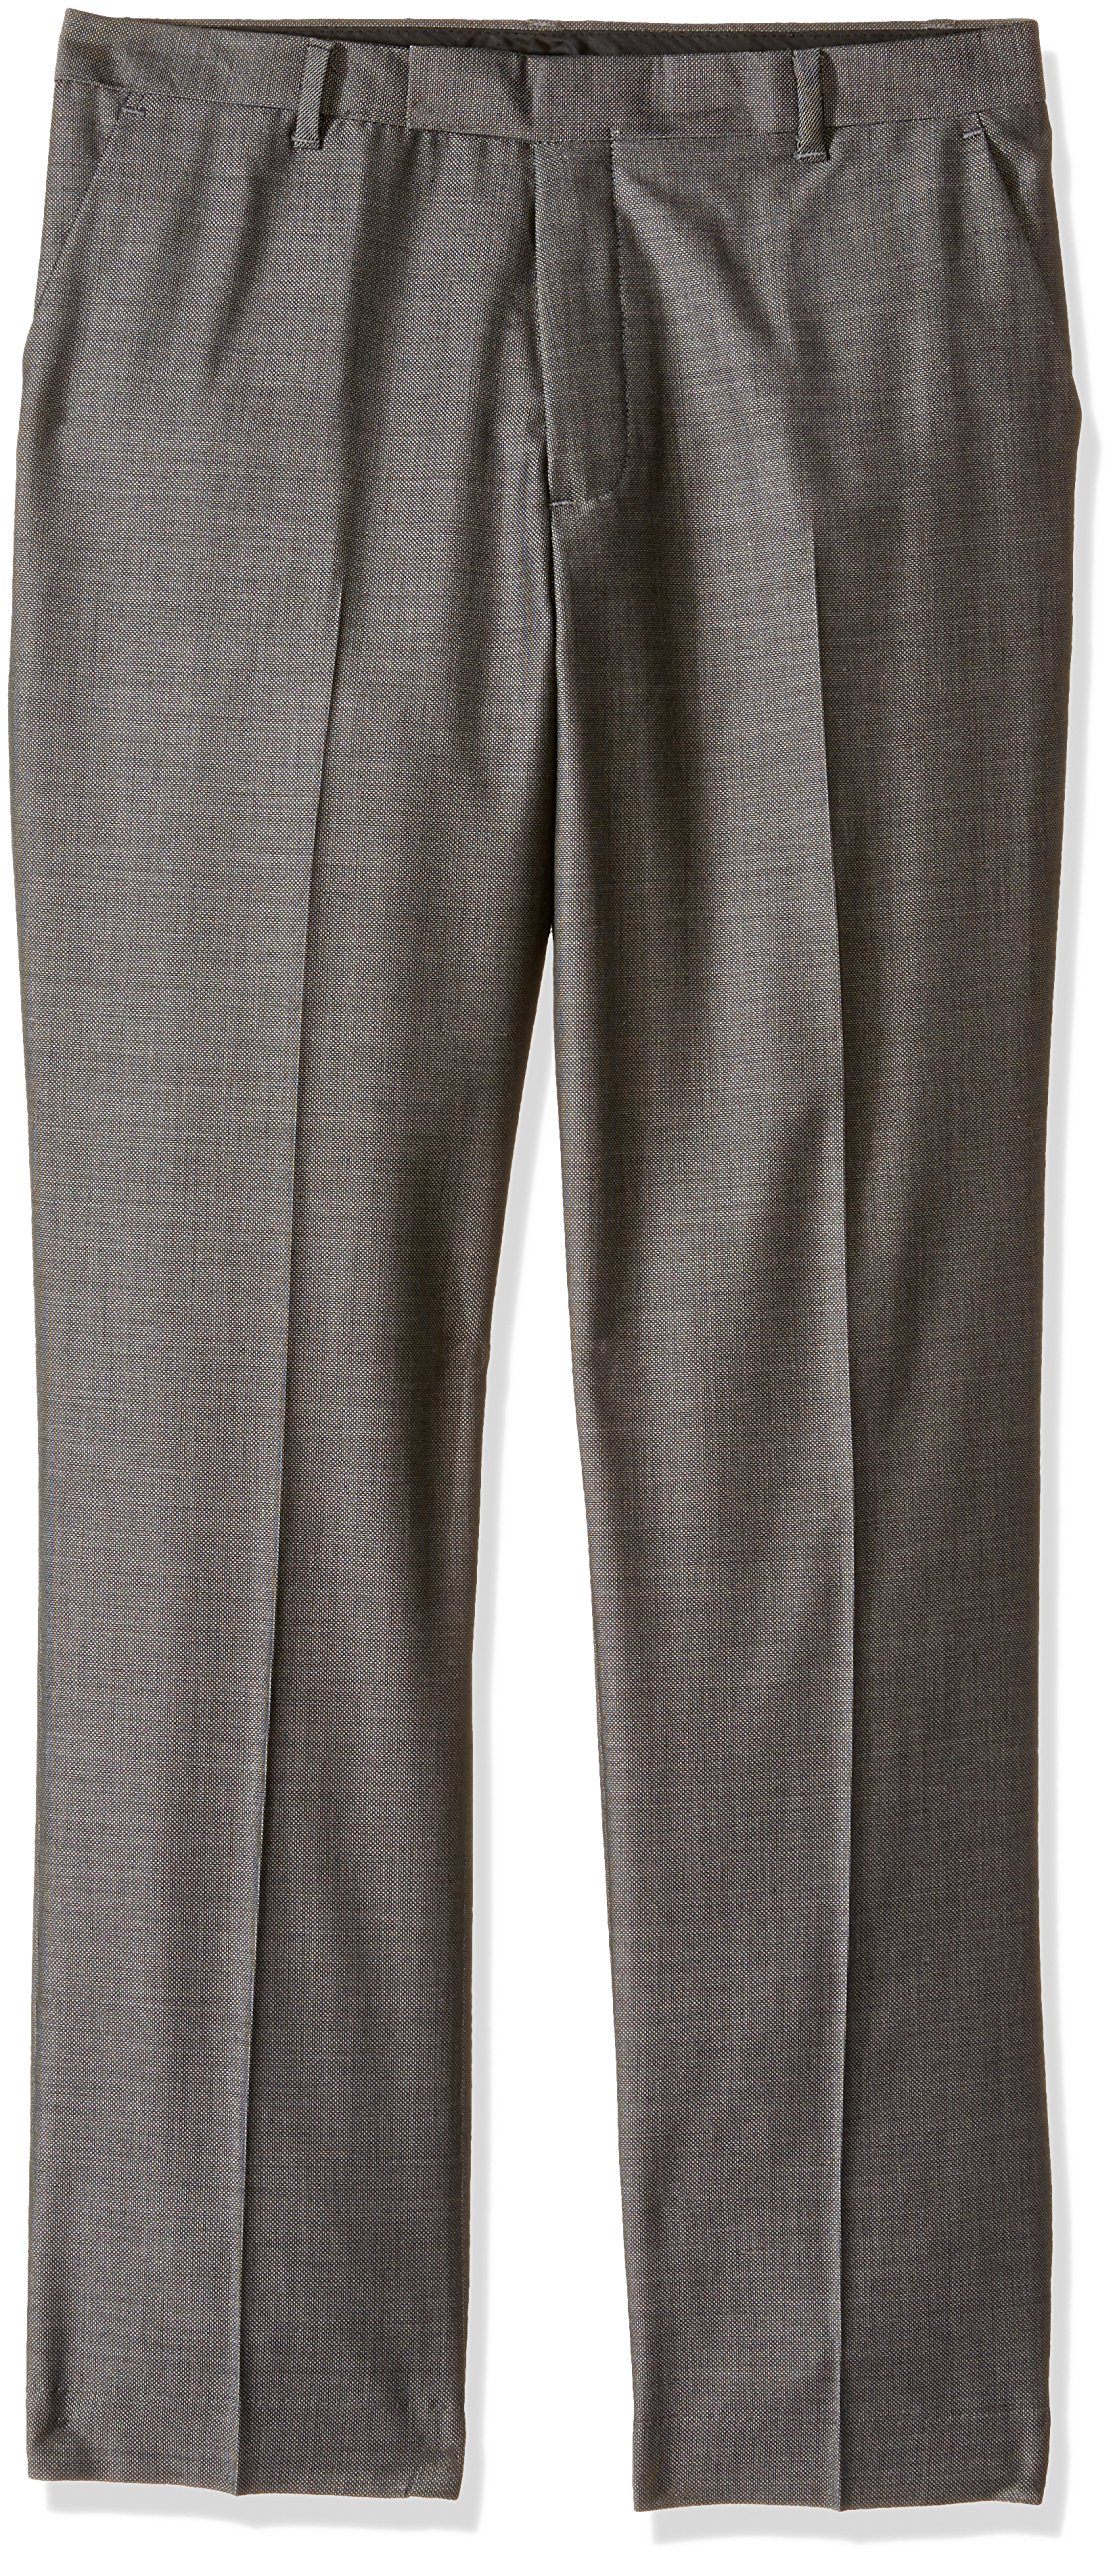 Calvin Klein Boys' Flat Front Dress Pant, Birdseye Black, 12